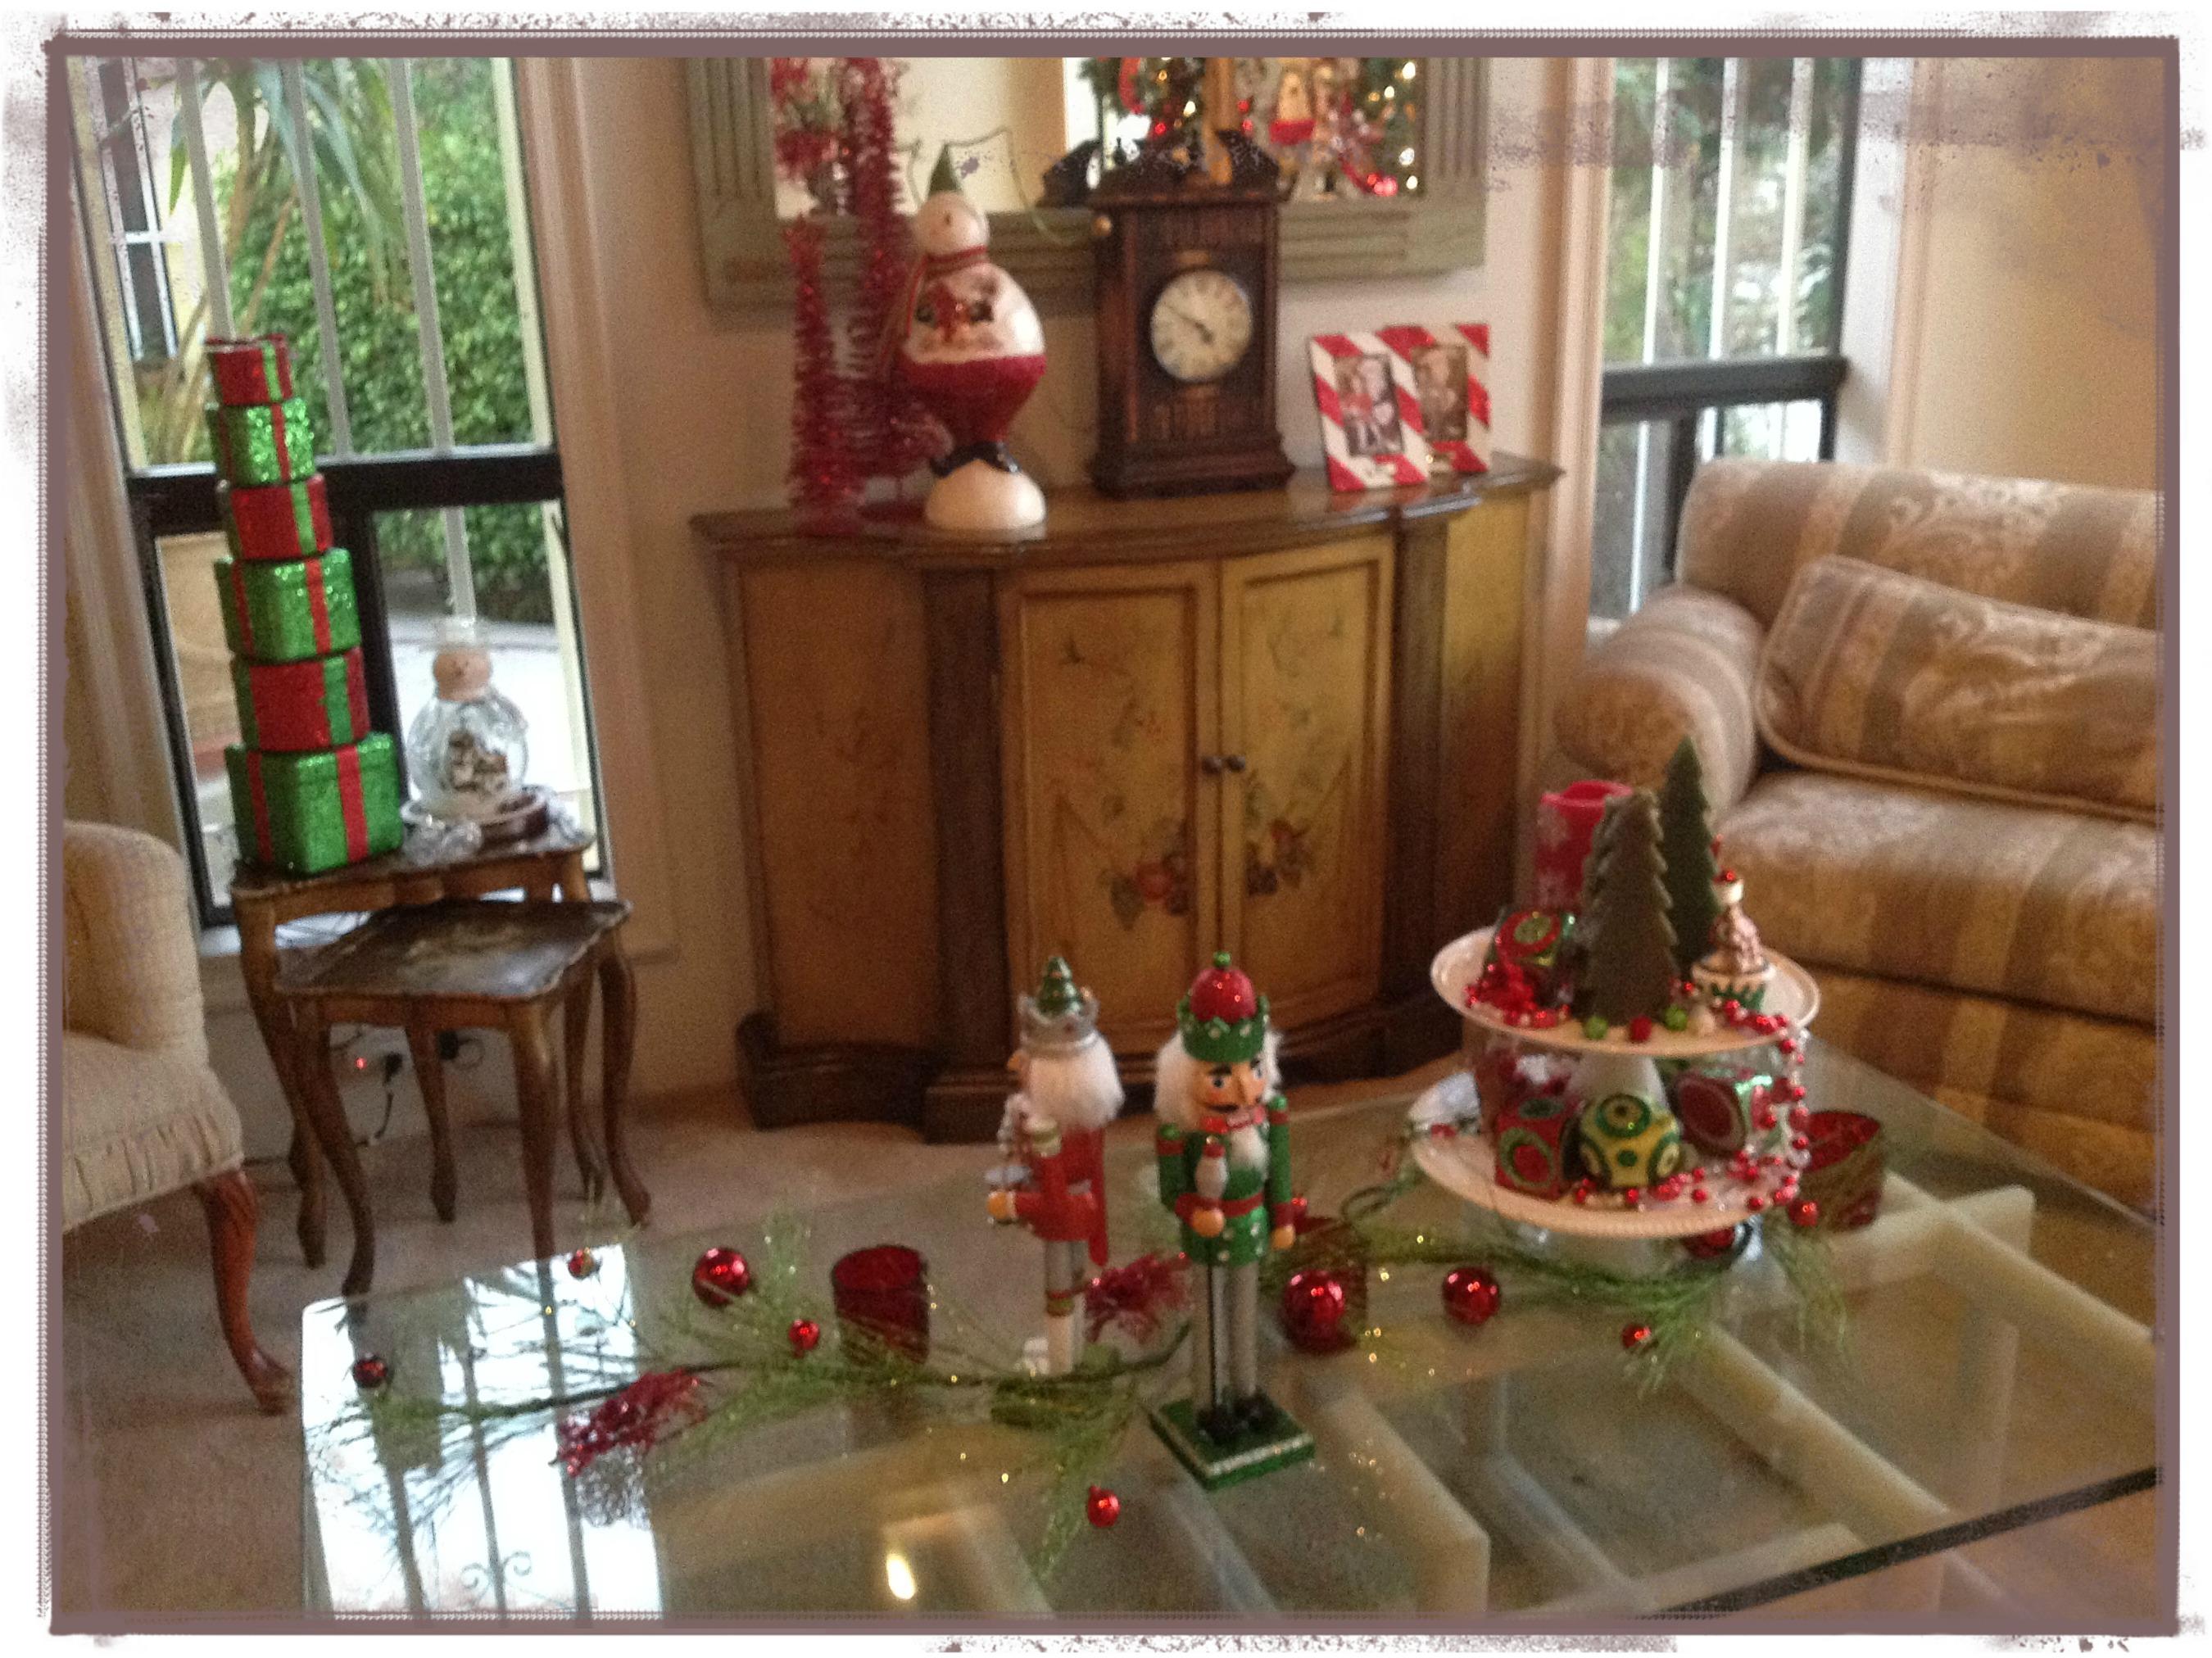 Decoracion navide a mesa de sala - Decoracion de mesas navidenas ...